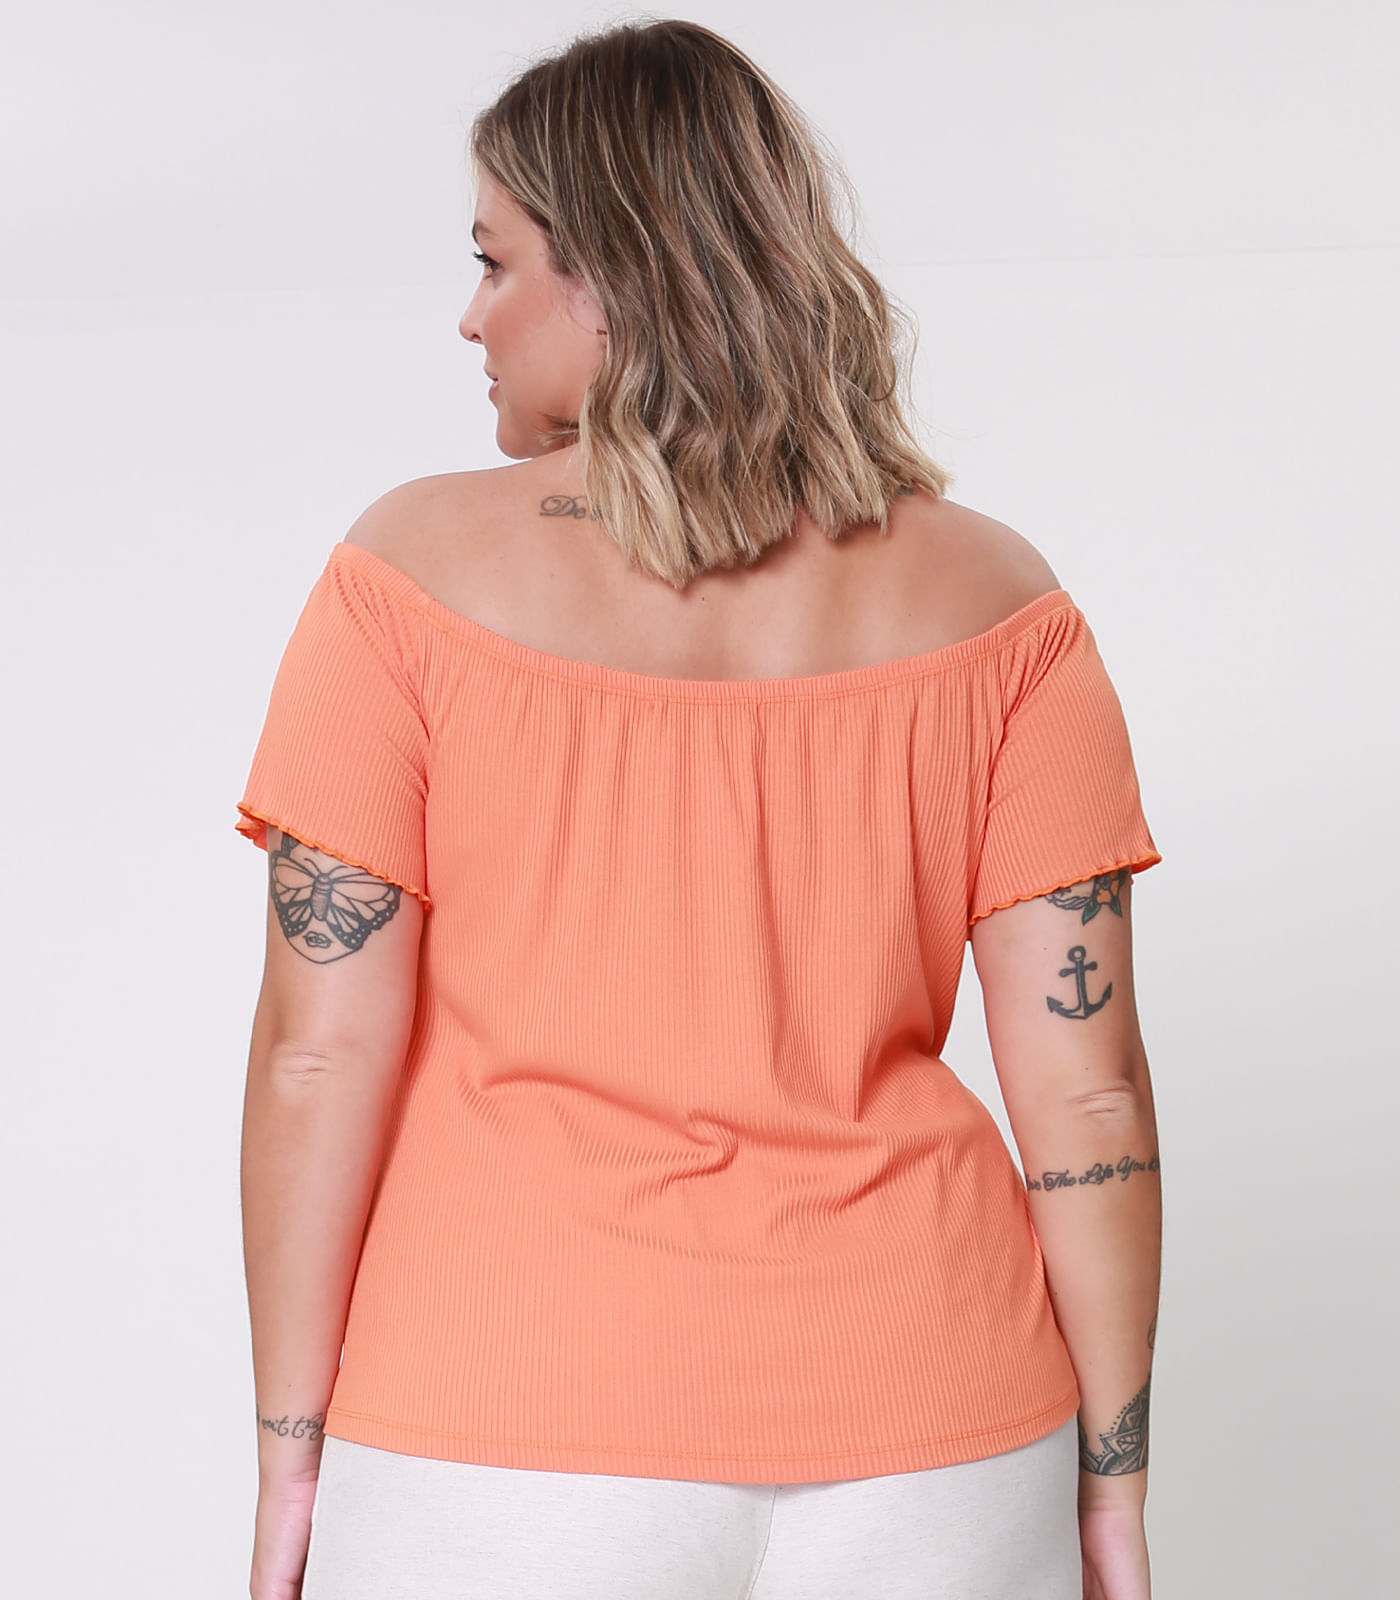 Blusa-Feminina-Plus-Size-Ciganinha-Secret-Glam-Laranja